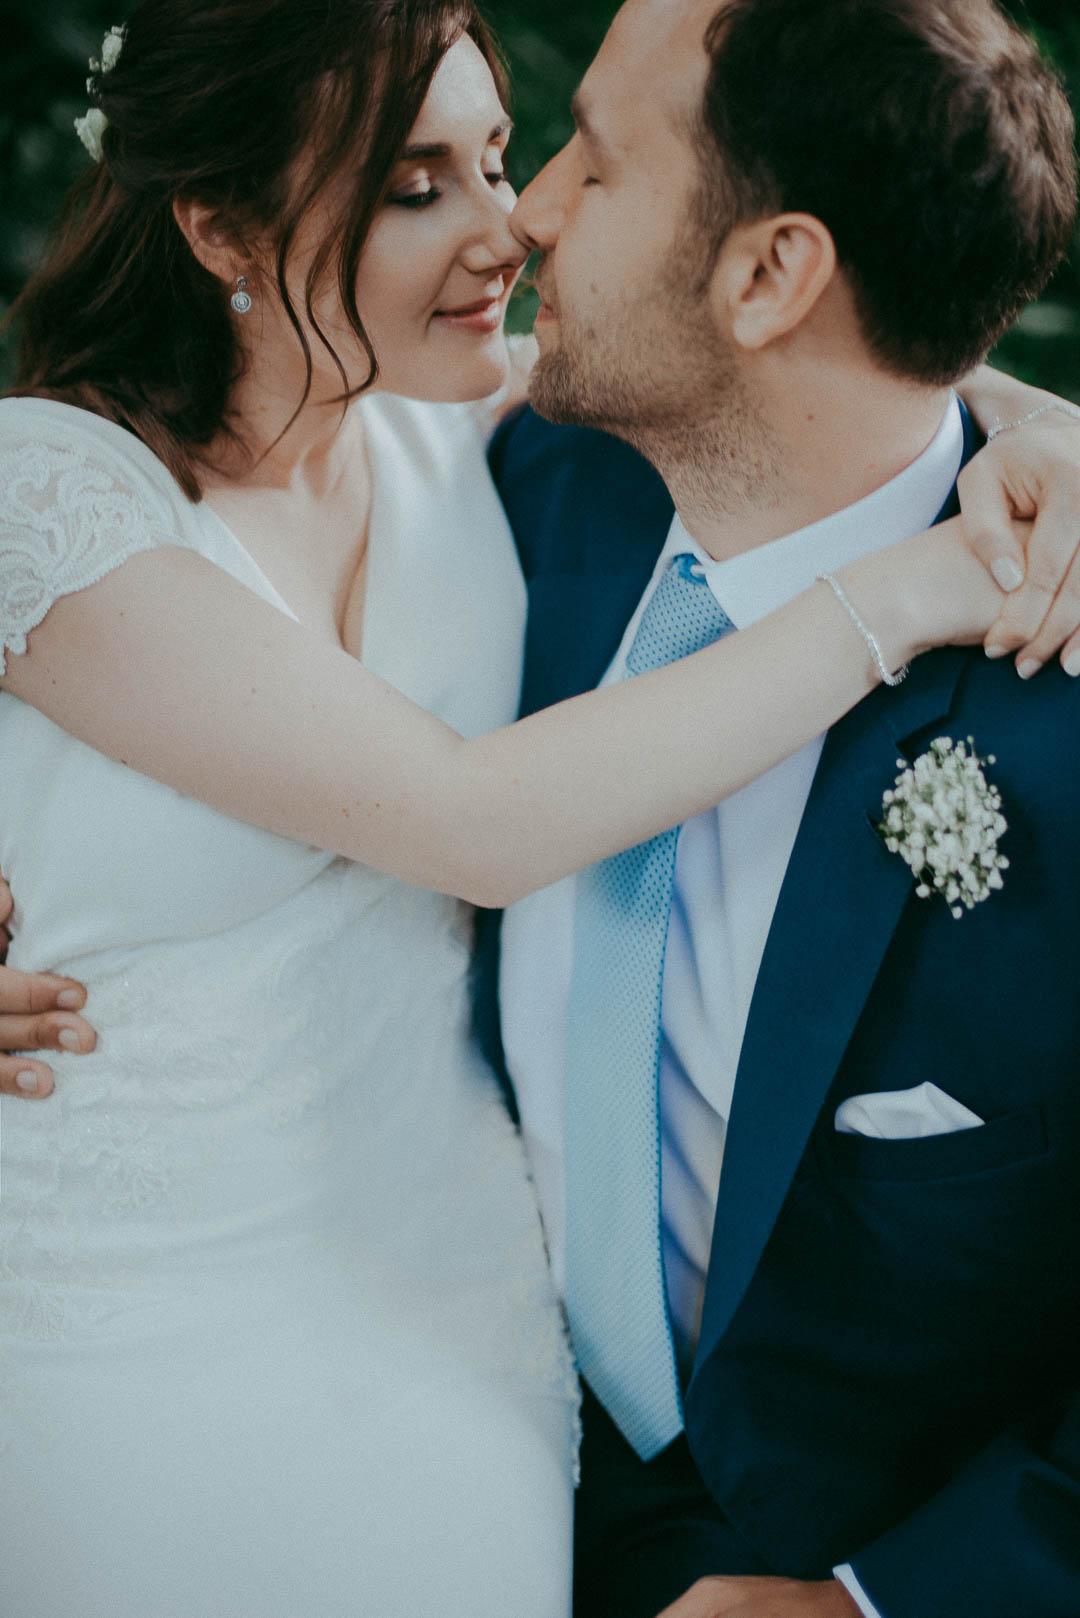 wedding-photographer-destination-fineart-bespoke-reportage-sorrento-parcodeiprincipi-vivianeizzo-spazio46-84